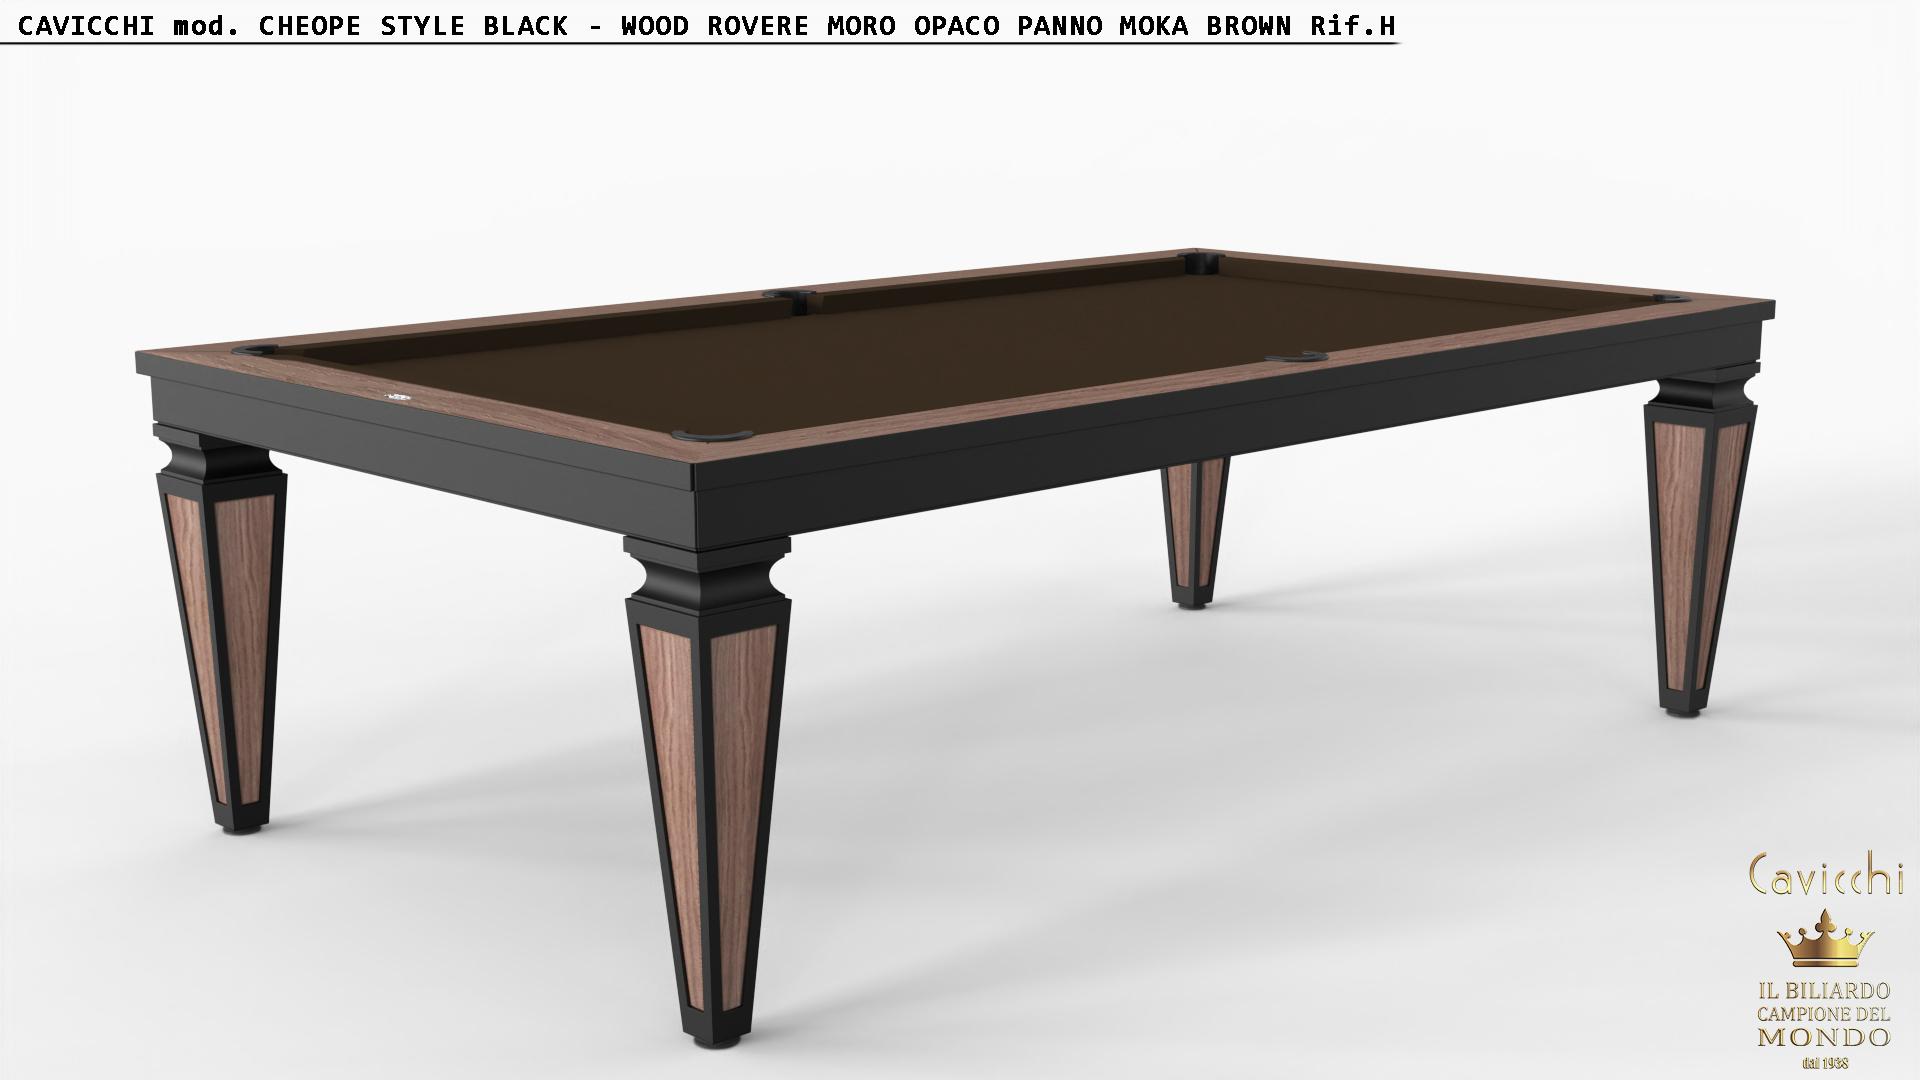 Бильярдный стол Cheope Style черный магазин шоу-рум 3